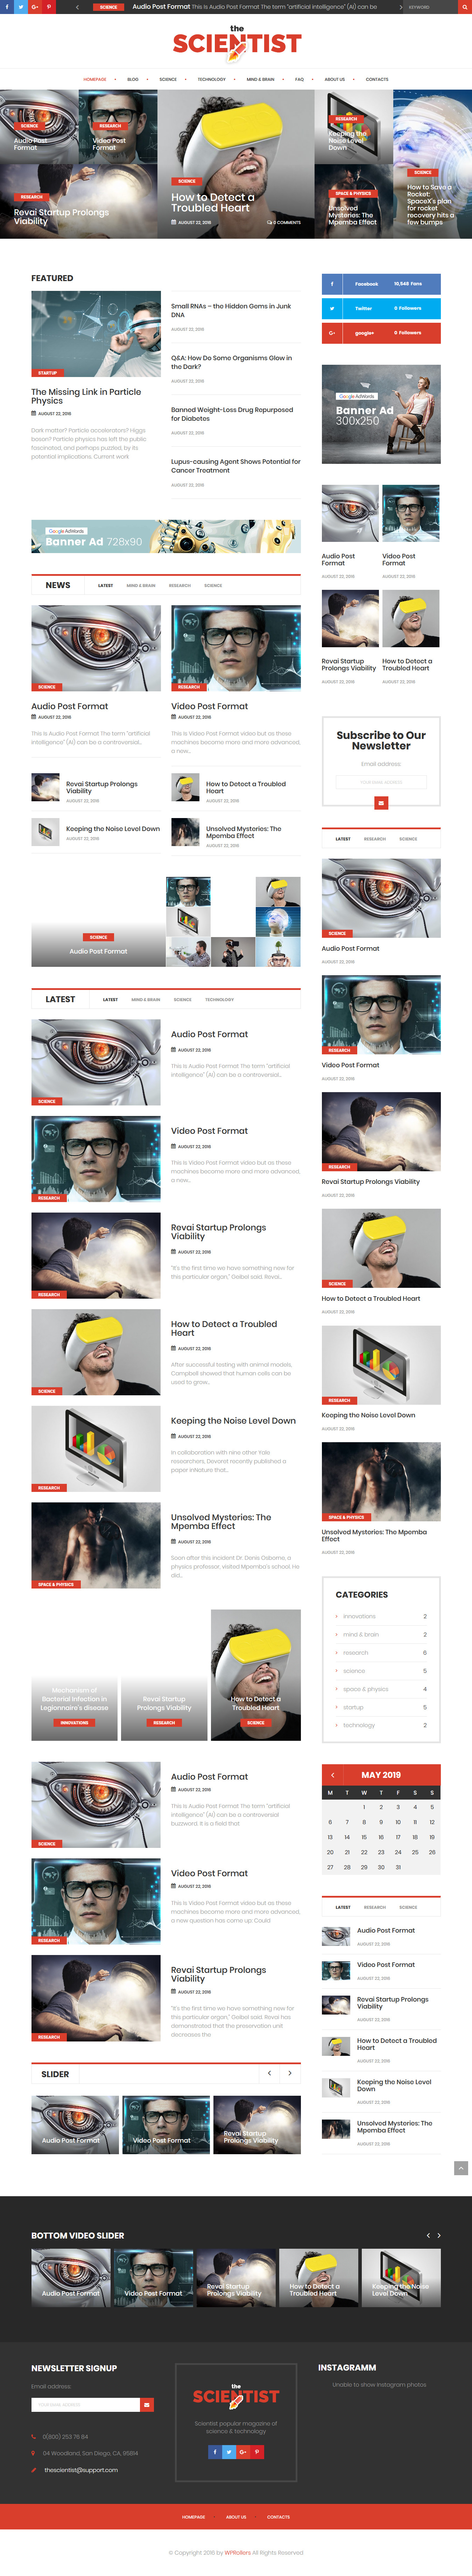 The scientist - Best Premium Science WordPress Theme